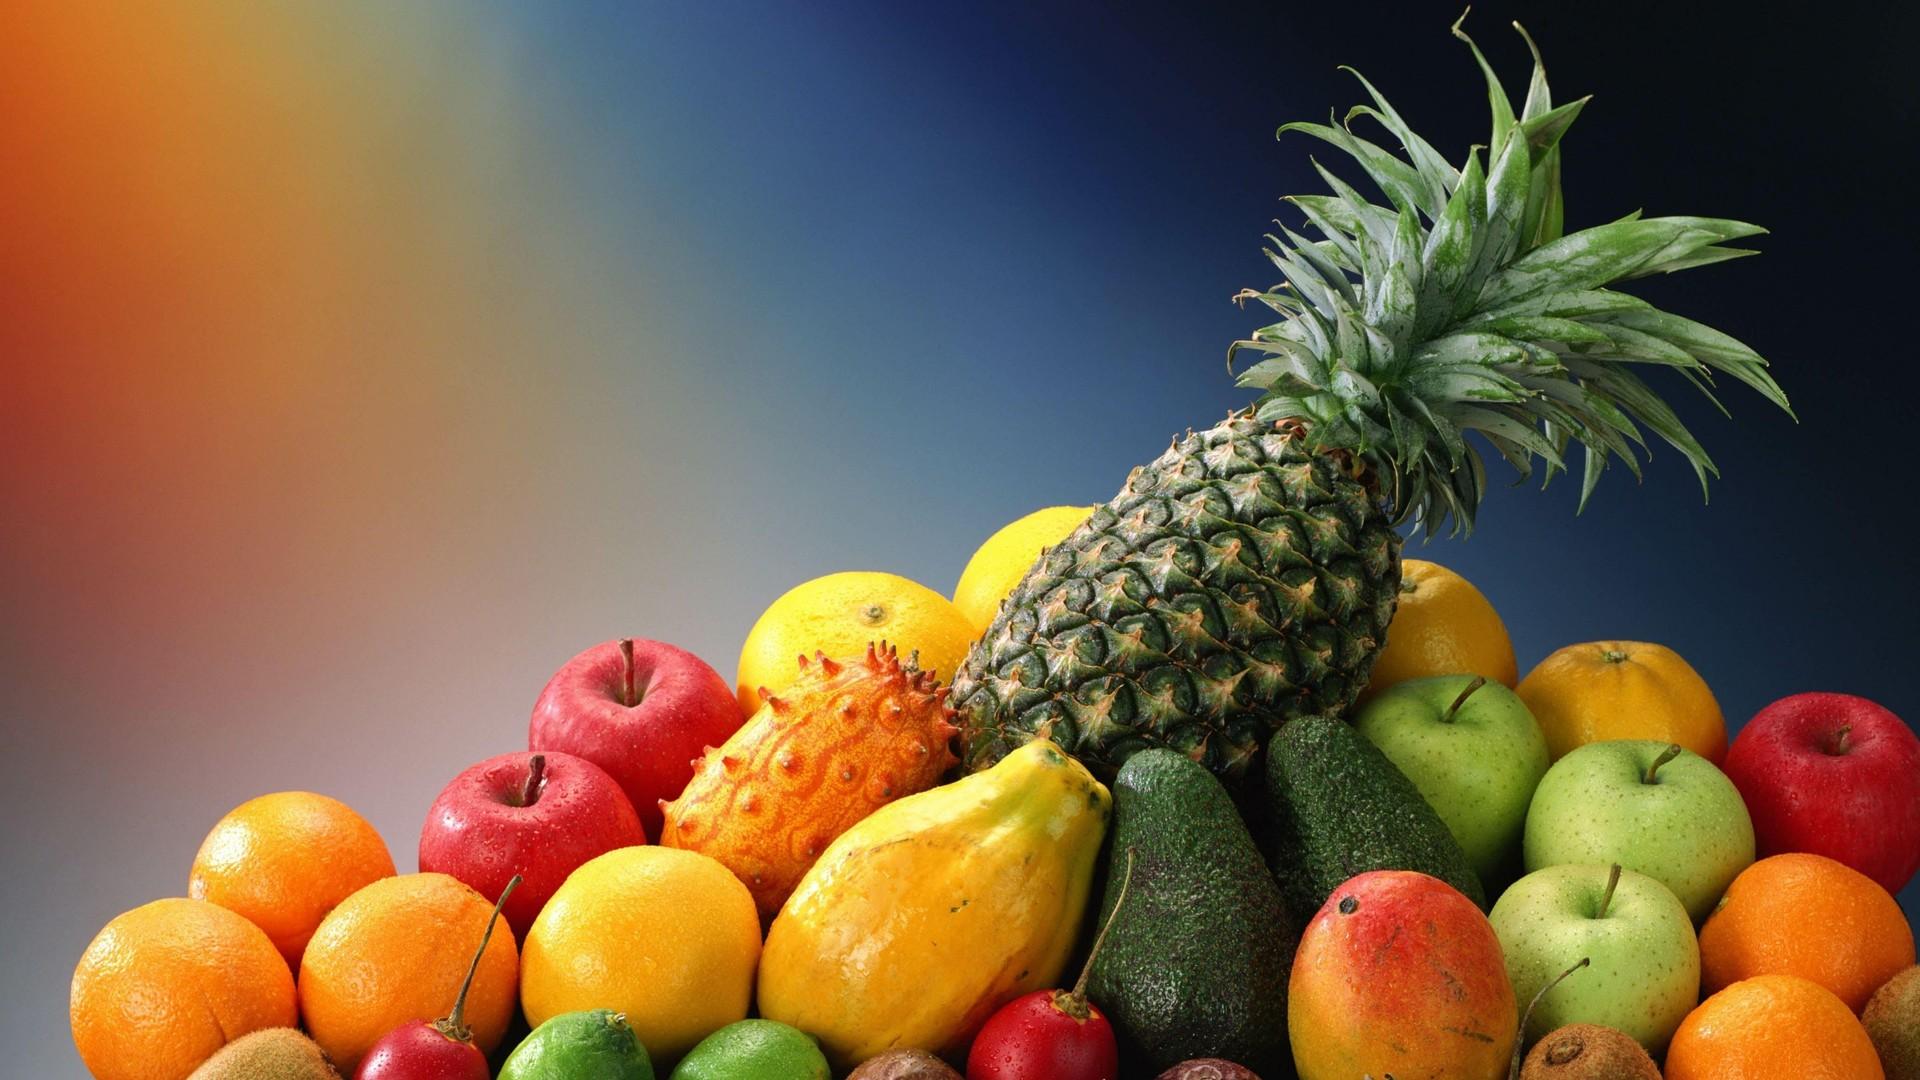 fruit wallpaper 48417